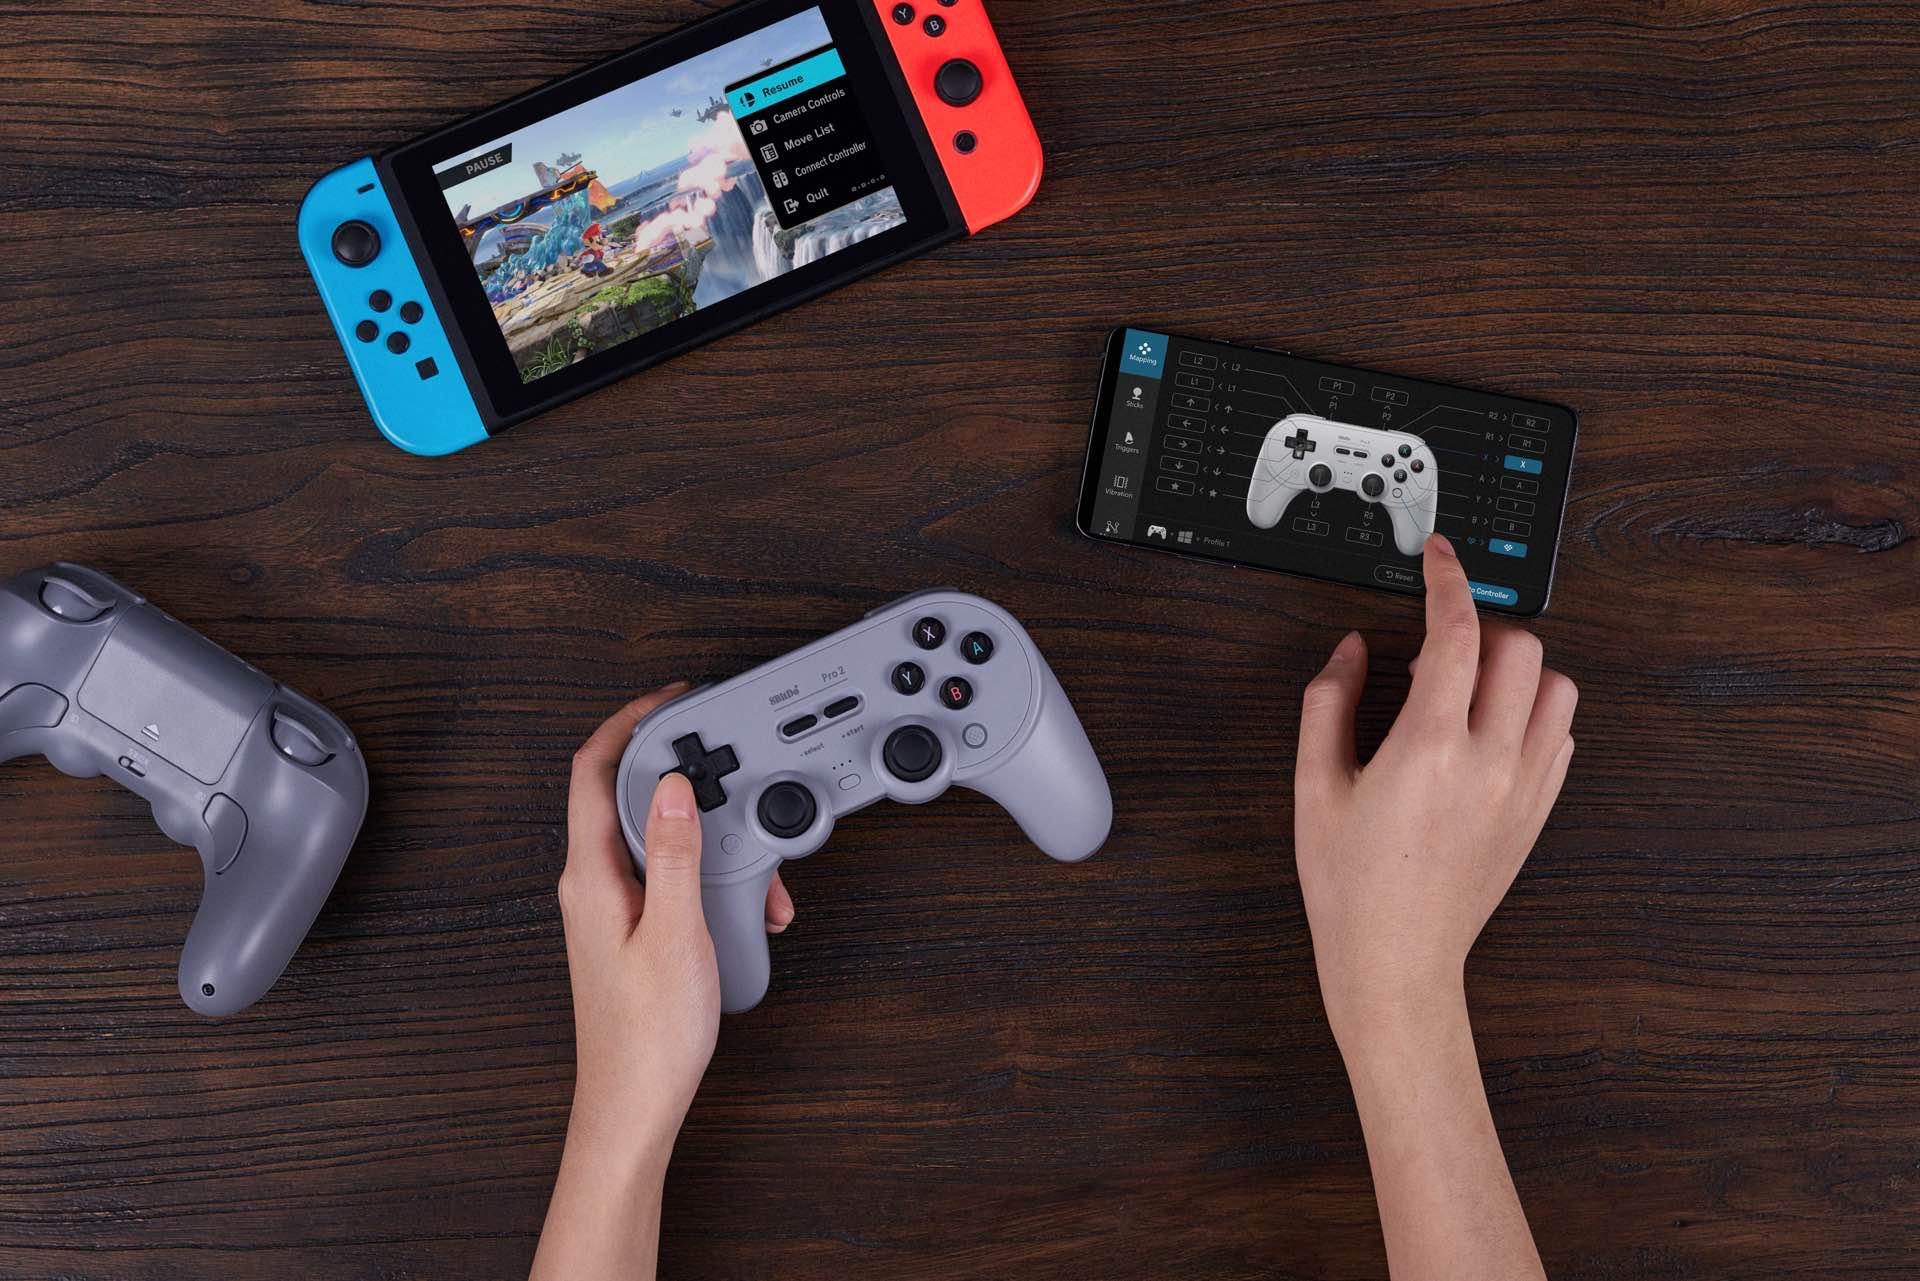 8bitdo-pro-2-game-controller